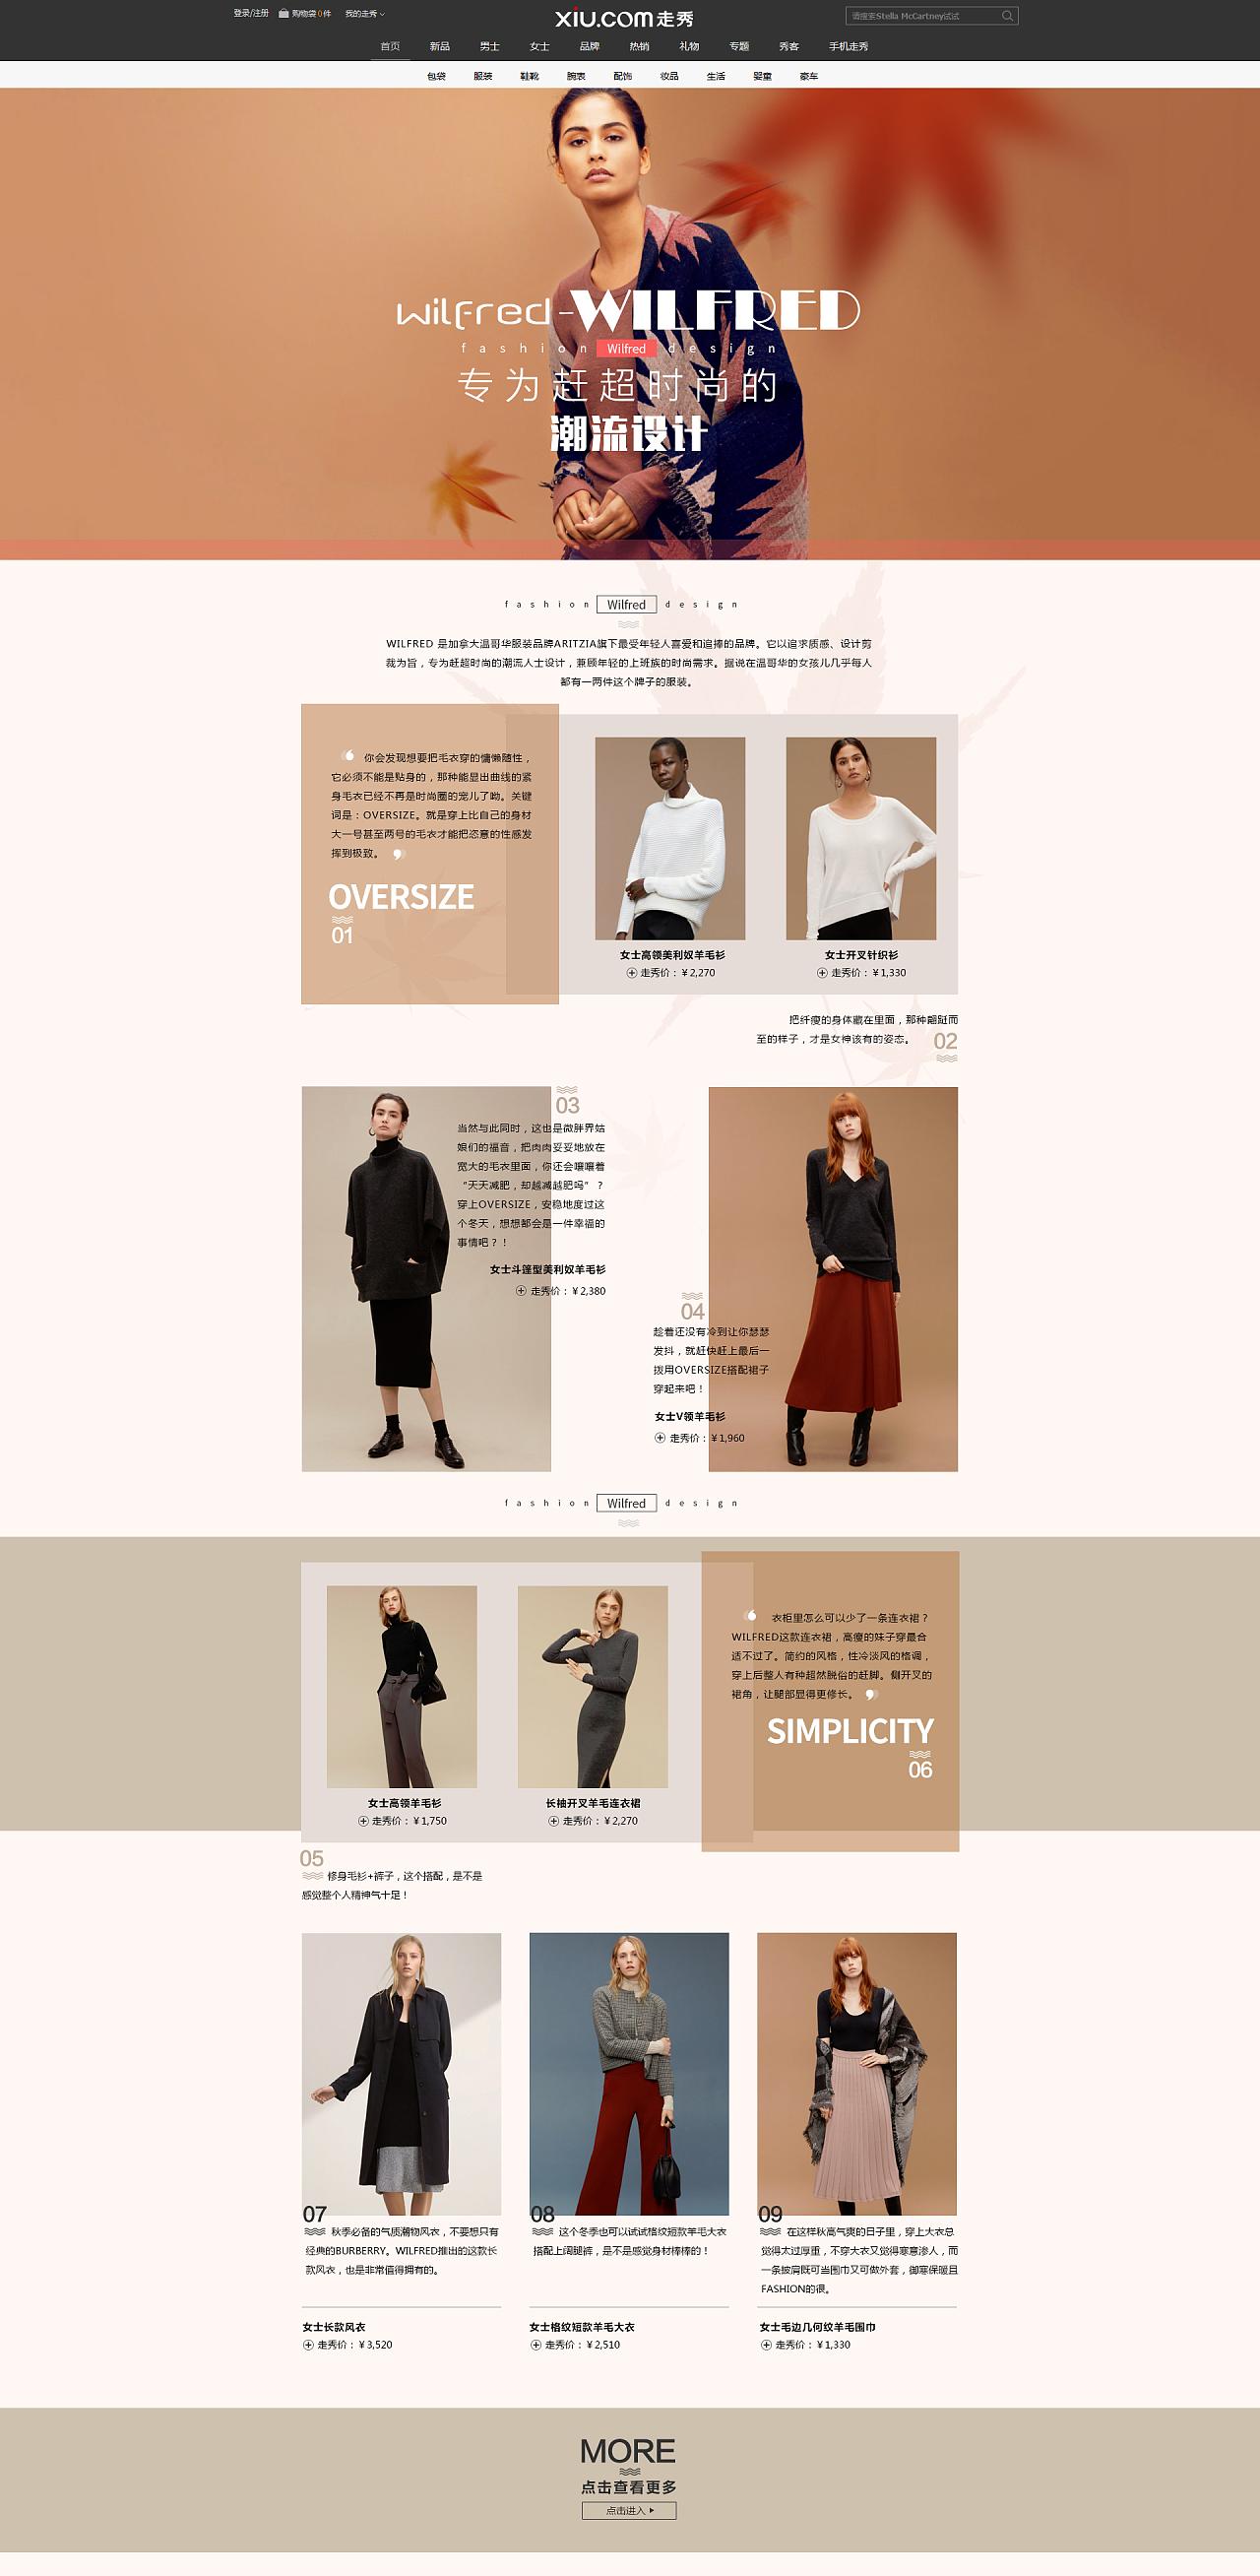 wilfred-女装 专为赶超时尚的潮流人士设计  走秀网 电商网页设计图片